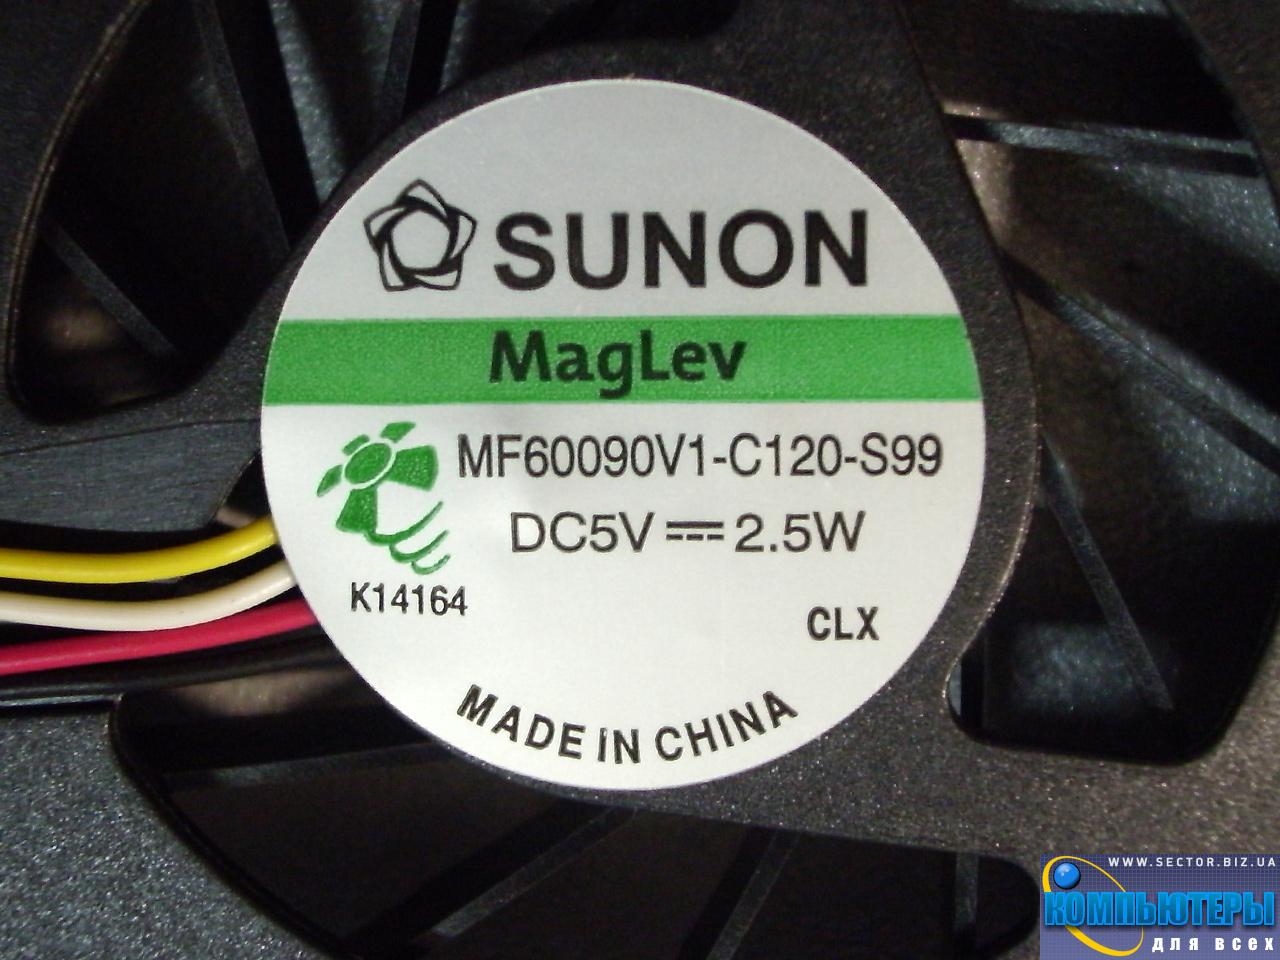 Кулер к ноутбуку Acer Extensa 5235 5635 5635G 5635Z 5635ZG ZR6 p/n: MF60090V1-C120-S99. Фото № 1.